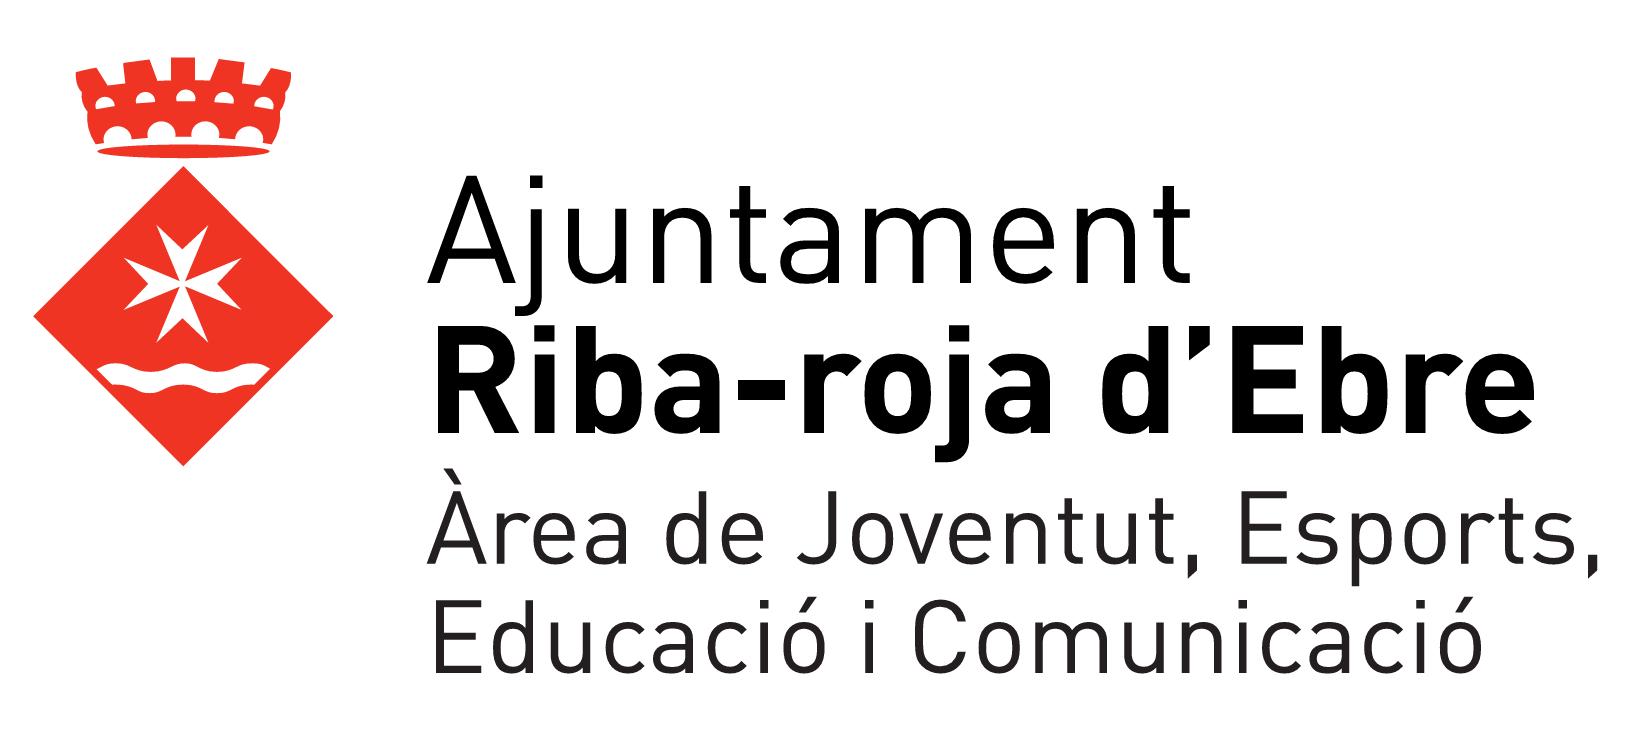 City of Riba-roja d'Ebre logo